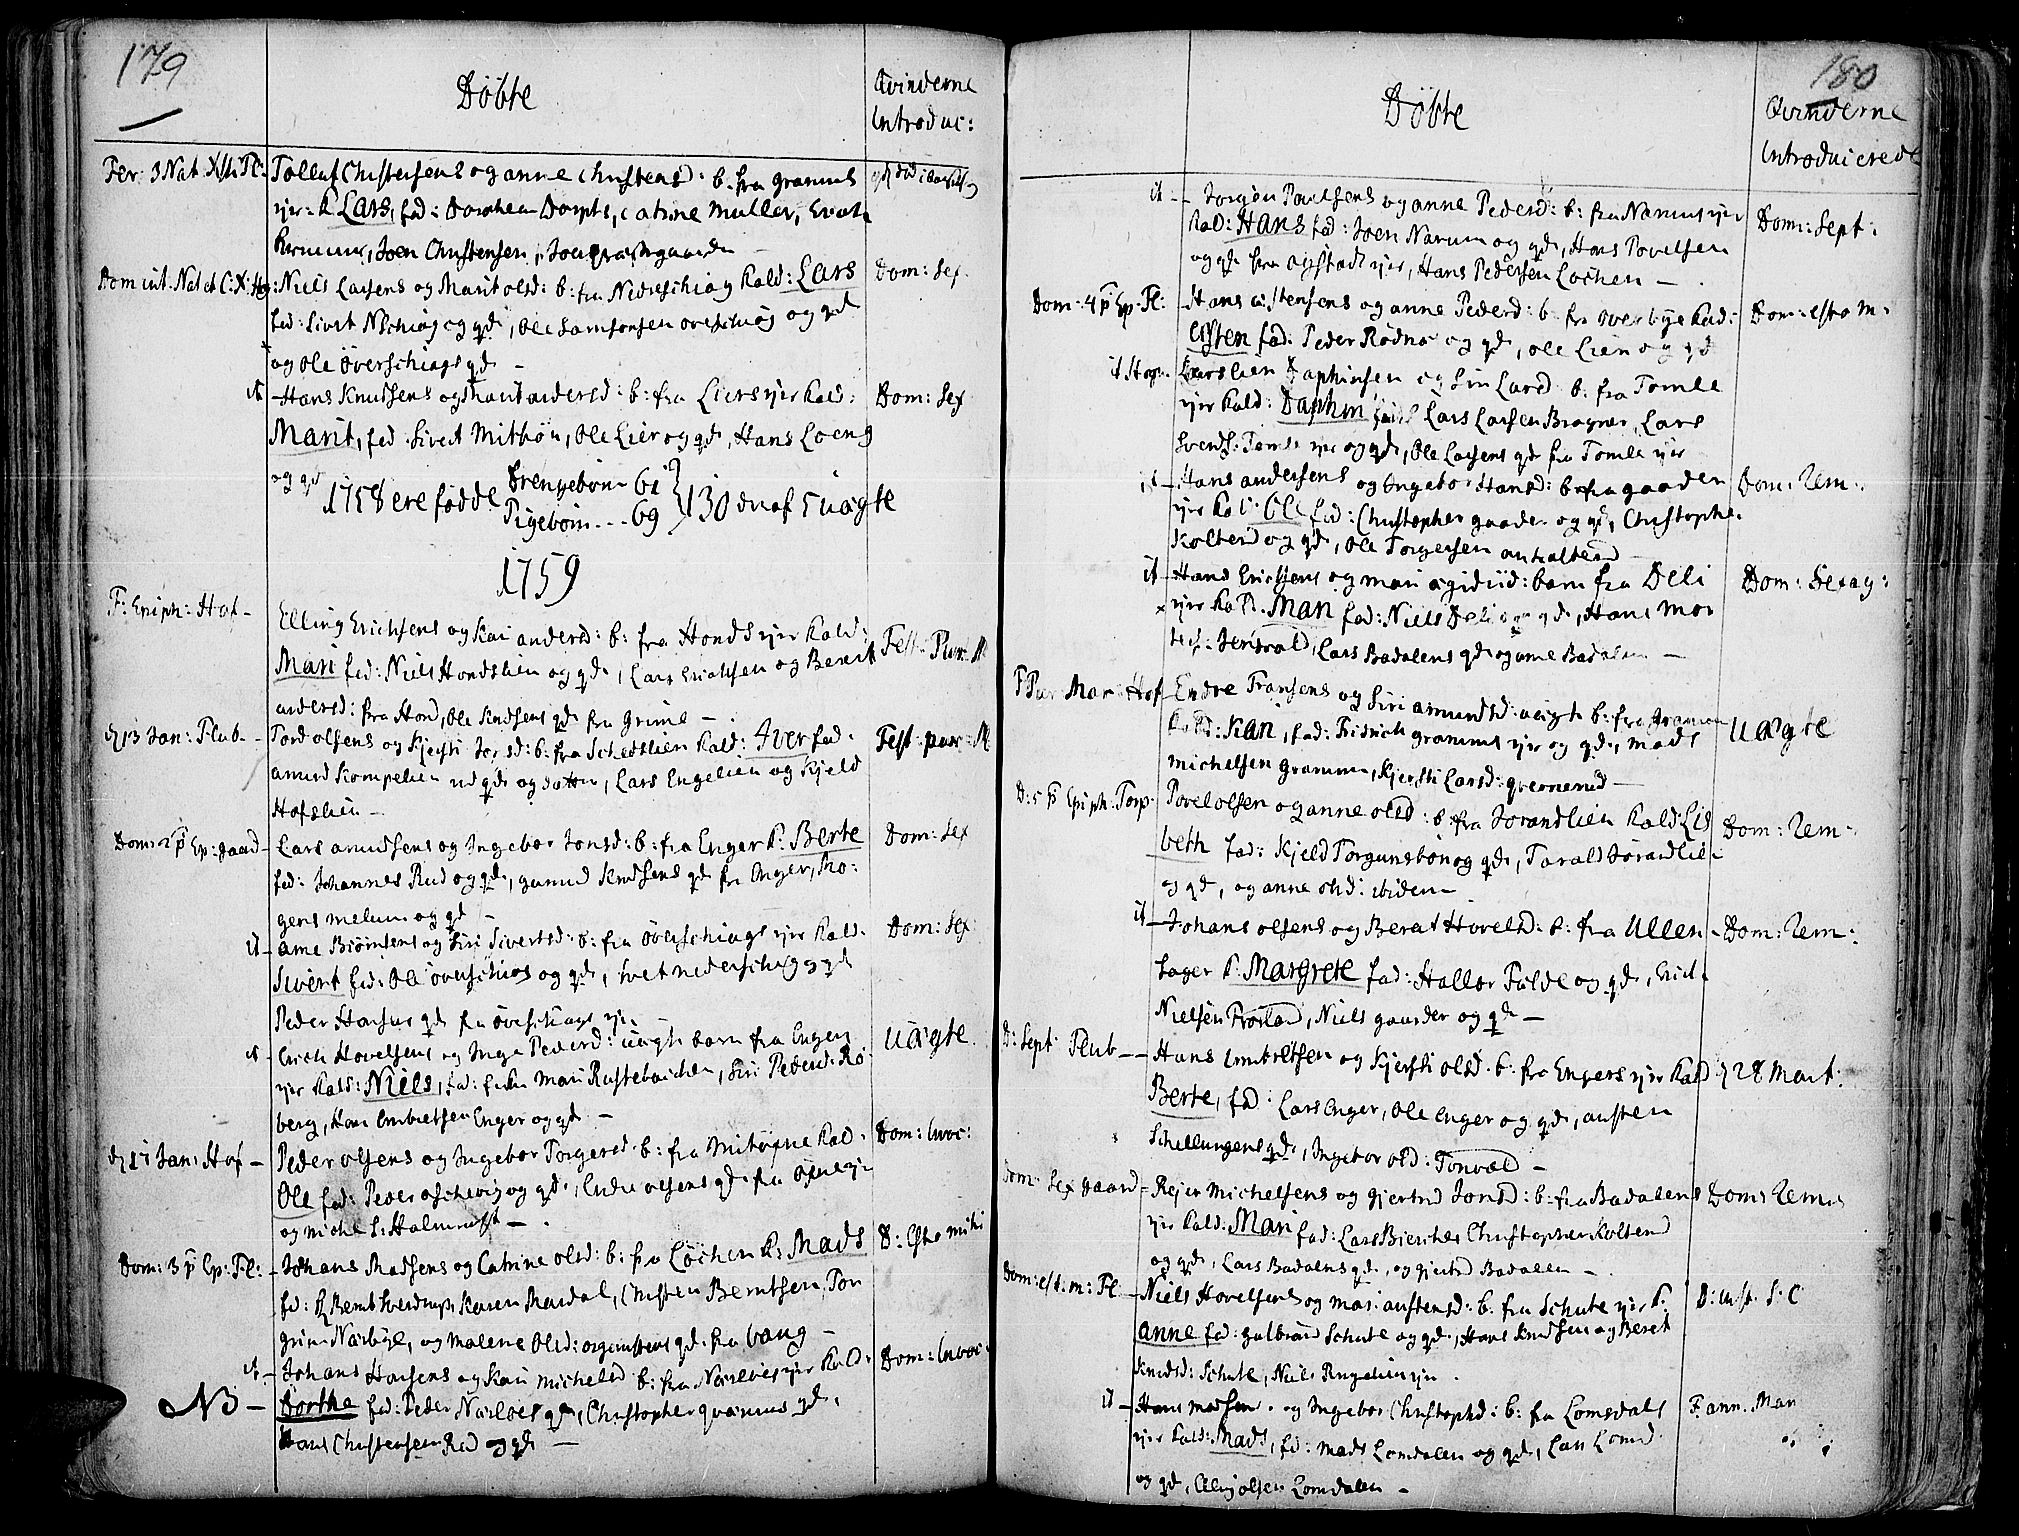 SAH, Land prestekontor, Ministerialbok nr. 2, 1733-1764, s. 179-180